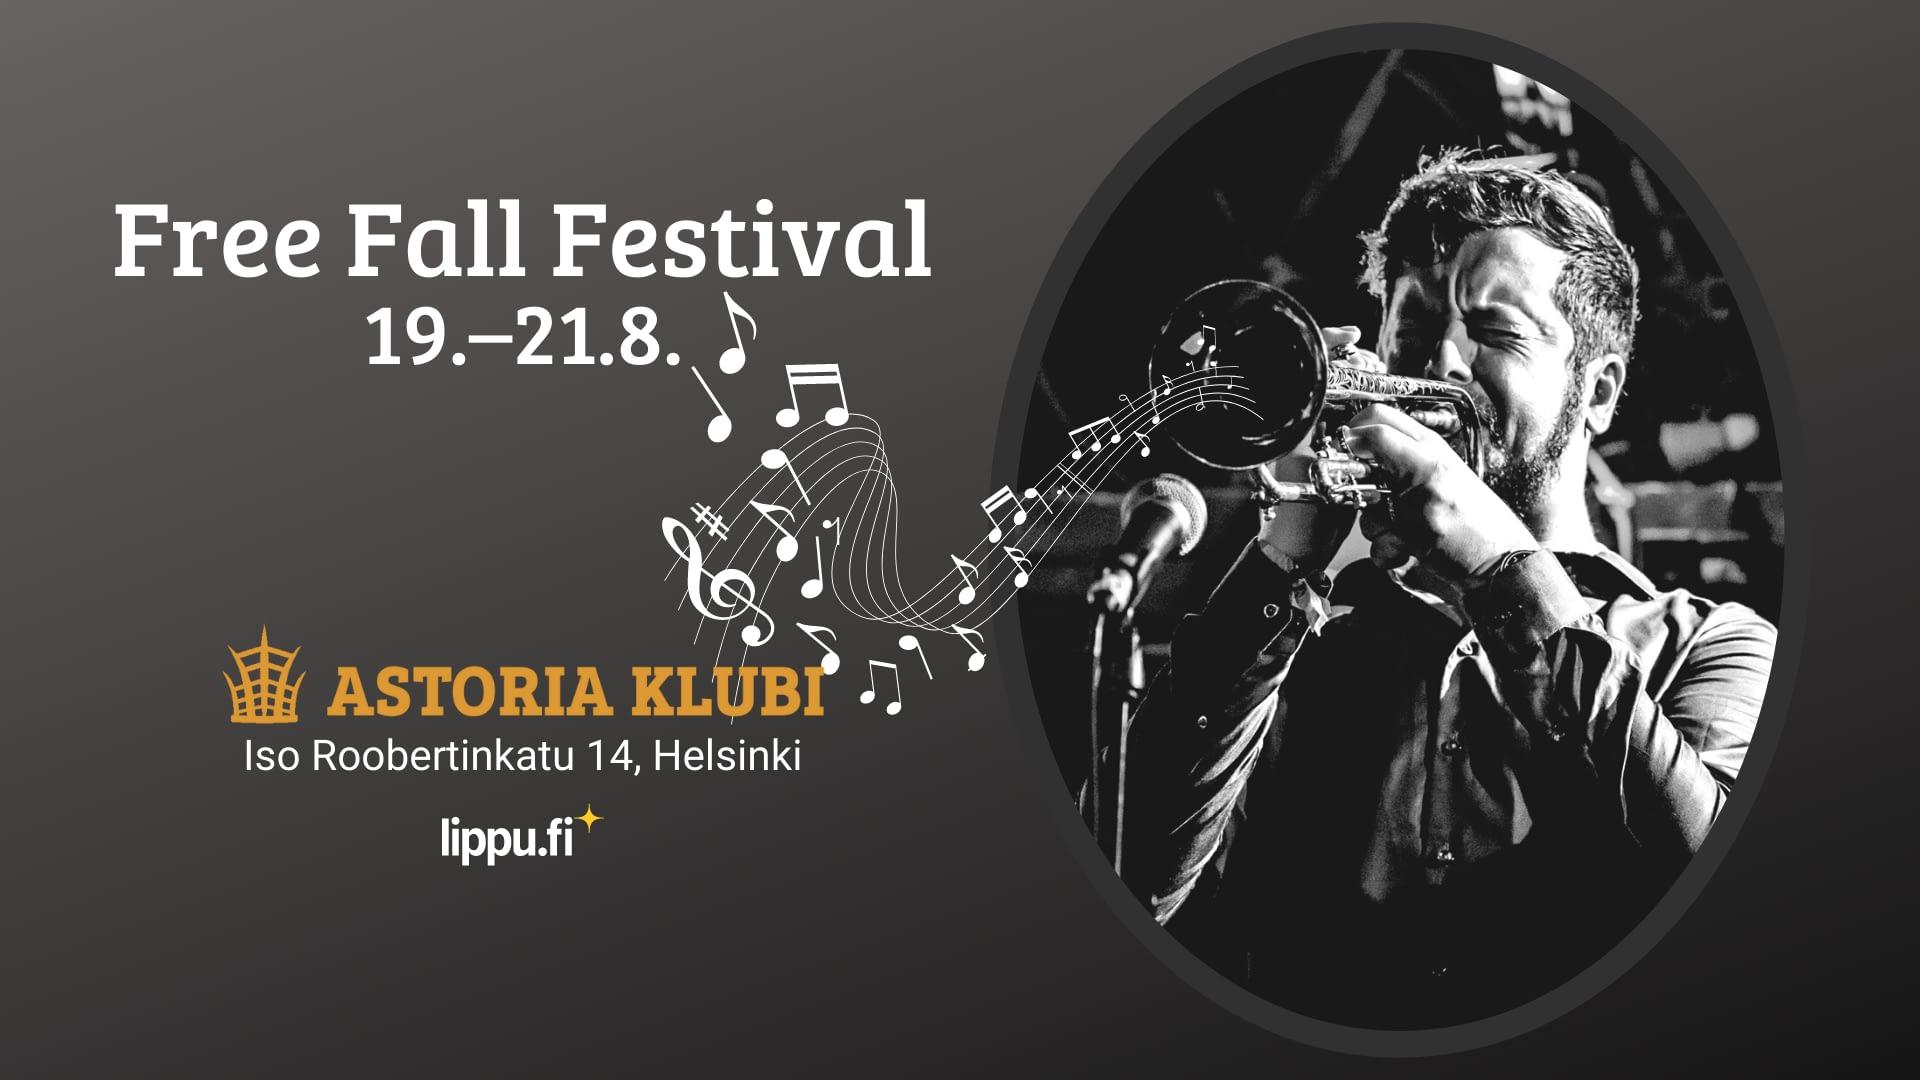 Free Fall Festival Astoria Klubilla